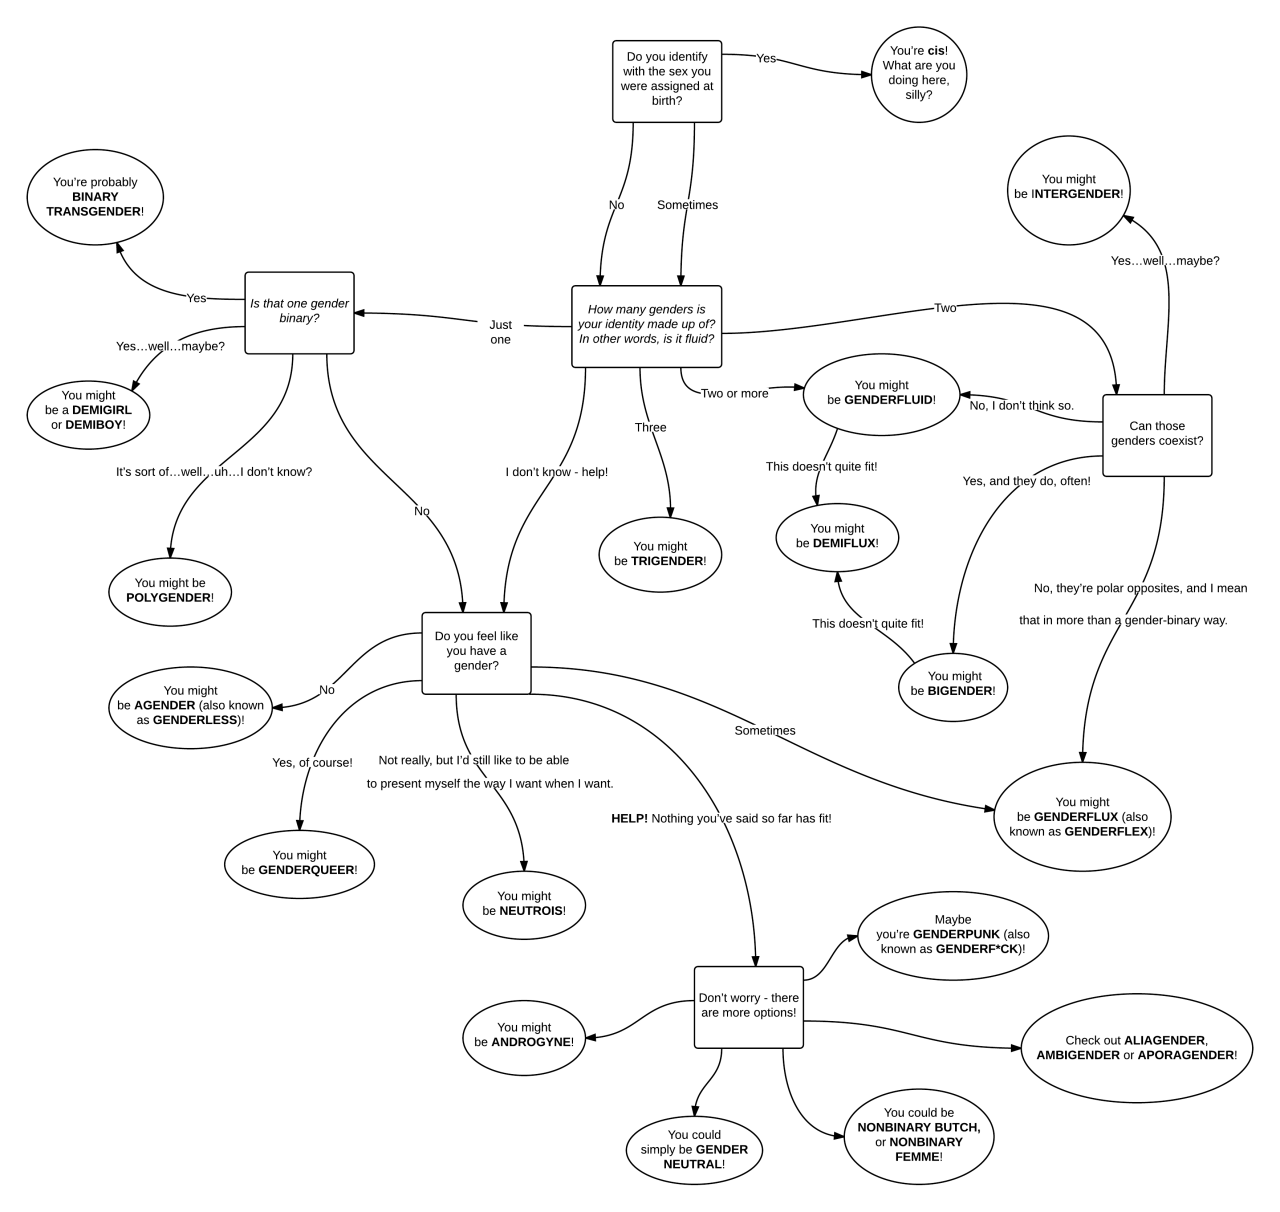 Non binary flow chart stonewall pinterest flowchart flowchart nvjuhfo Image collections